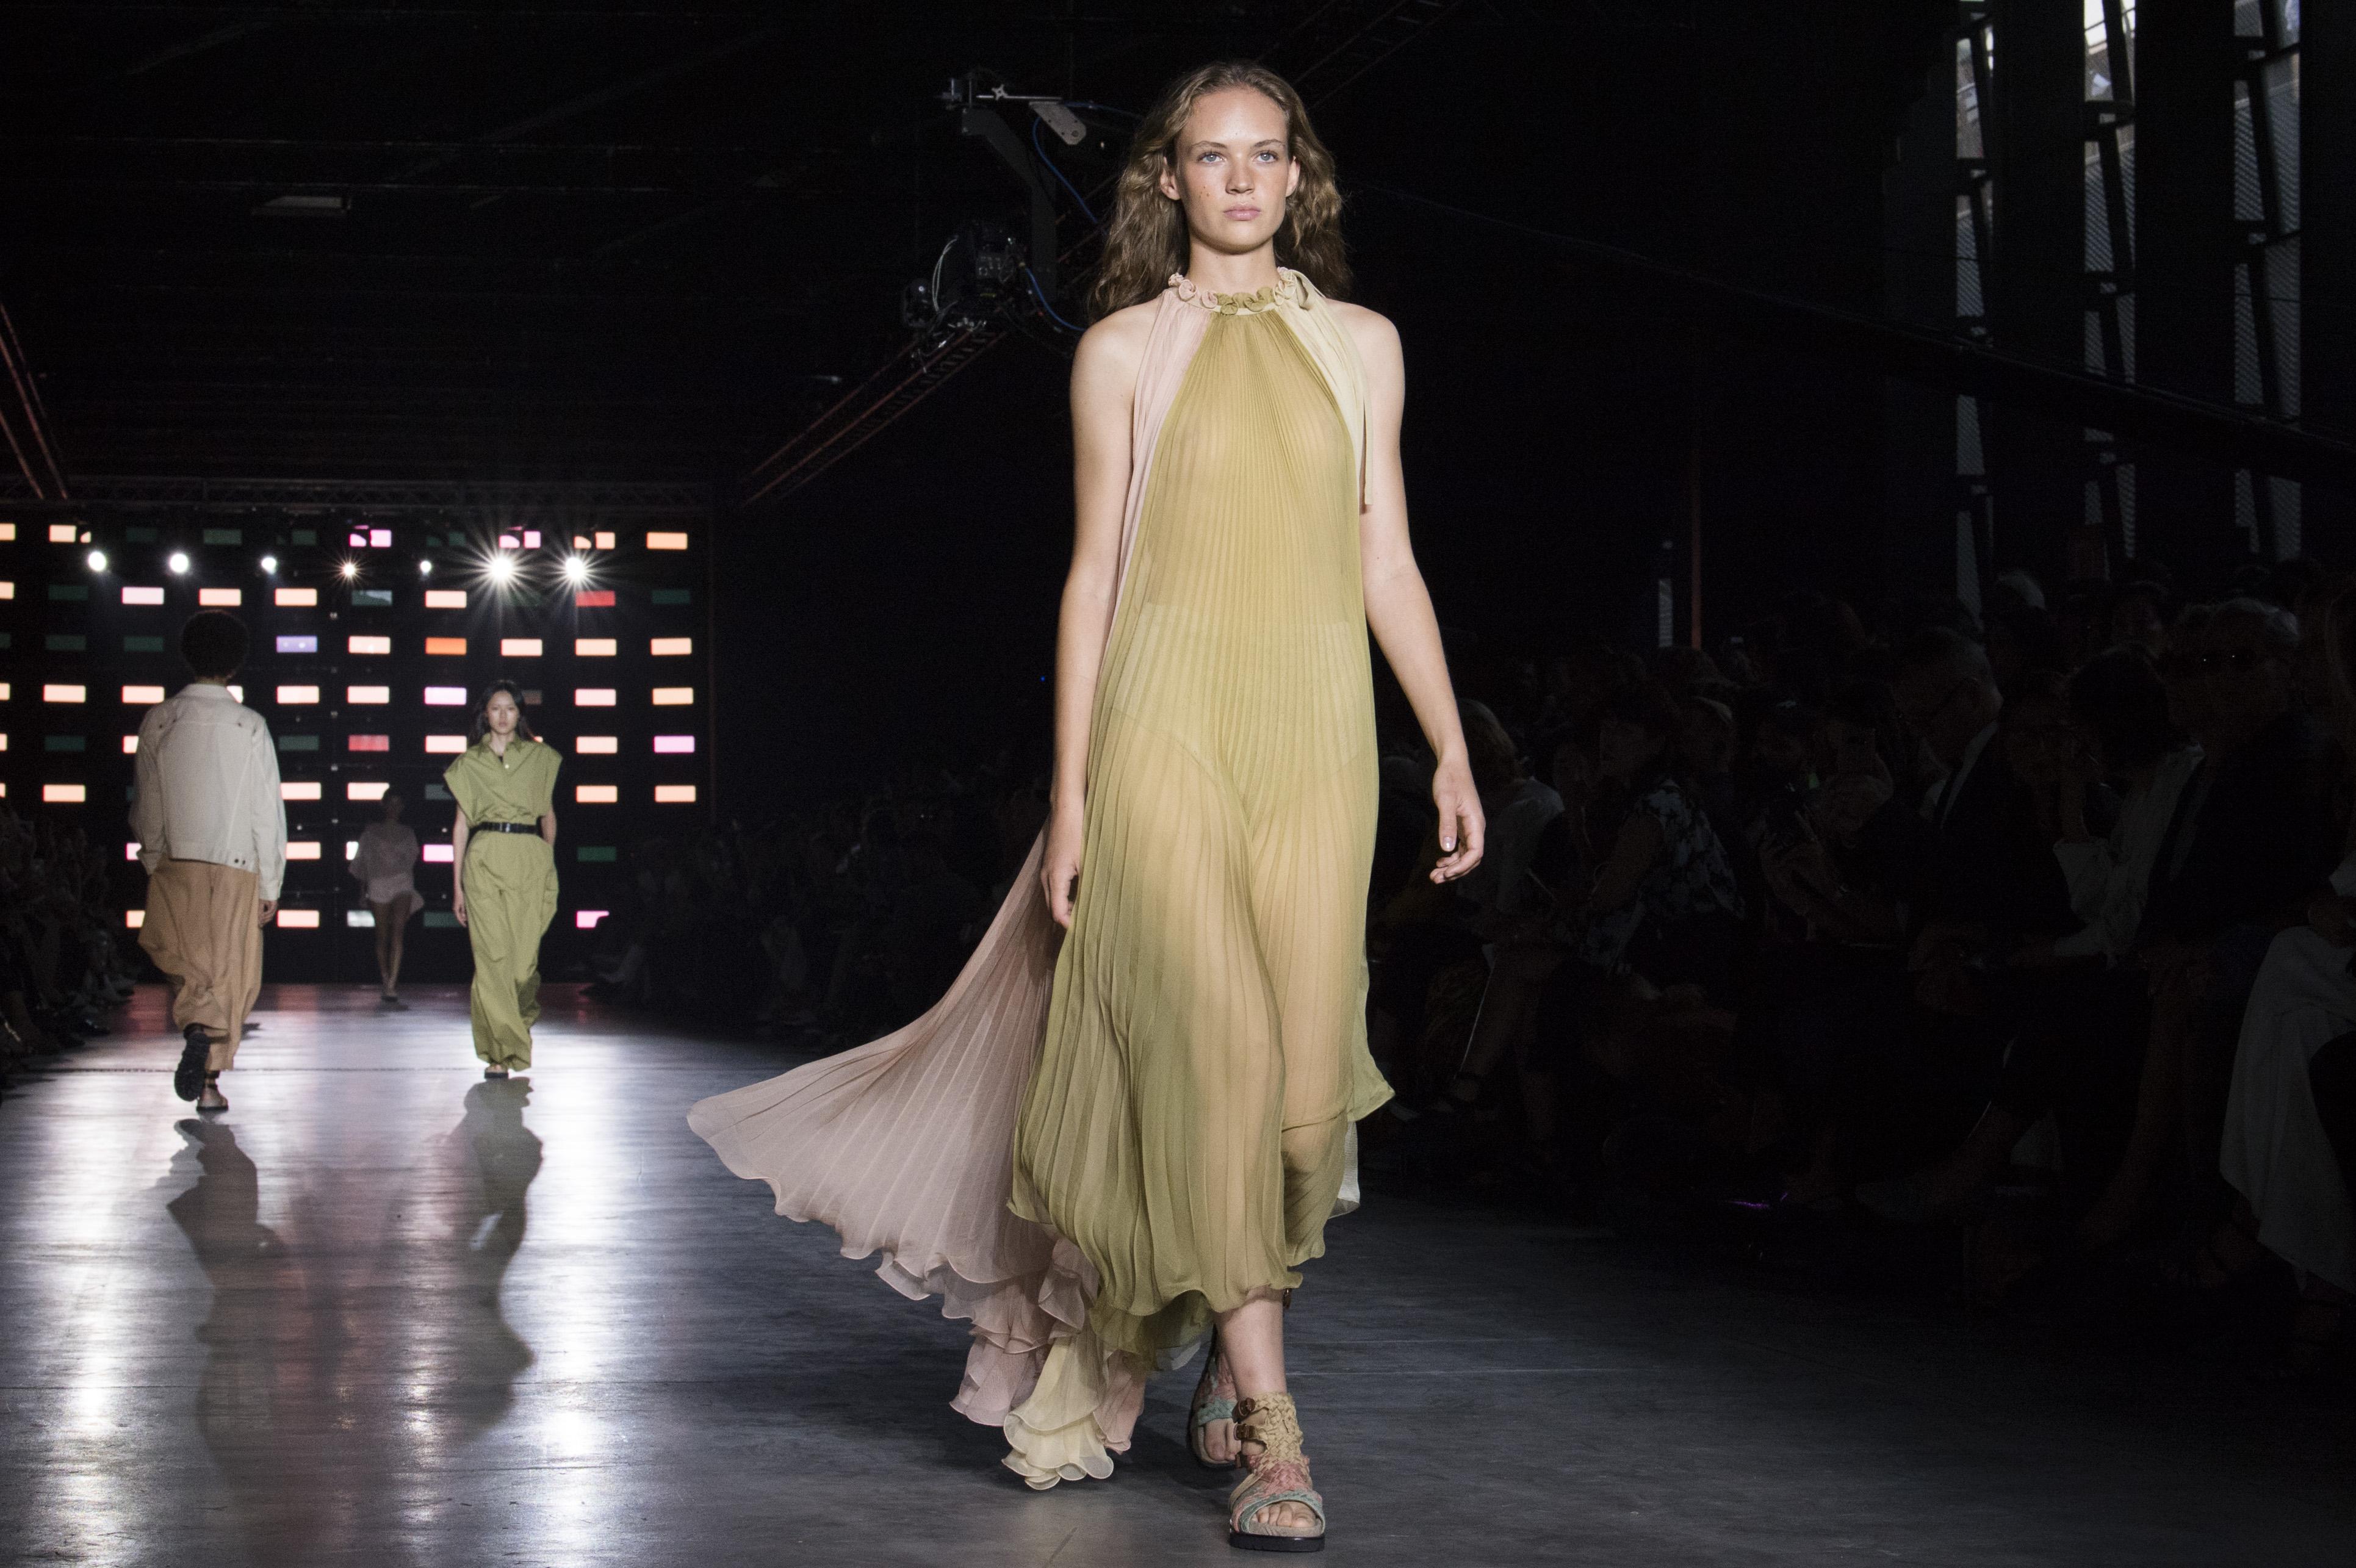 Pleated Pleasure: οι πλισέ φούστες είναι η κομψή επιλογή για αυτή την εποχή